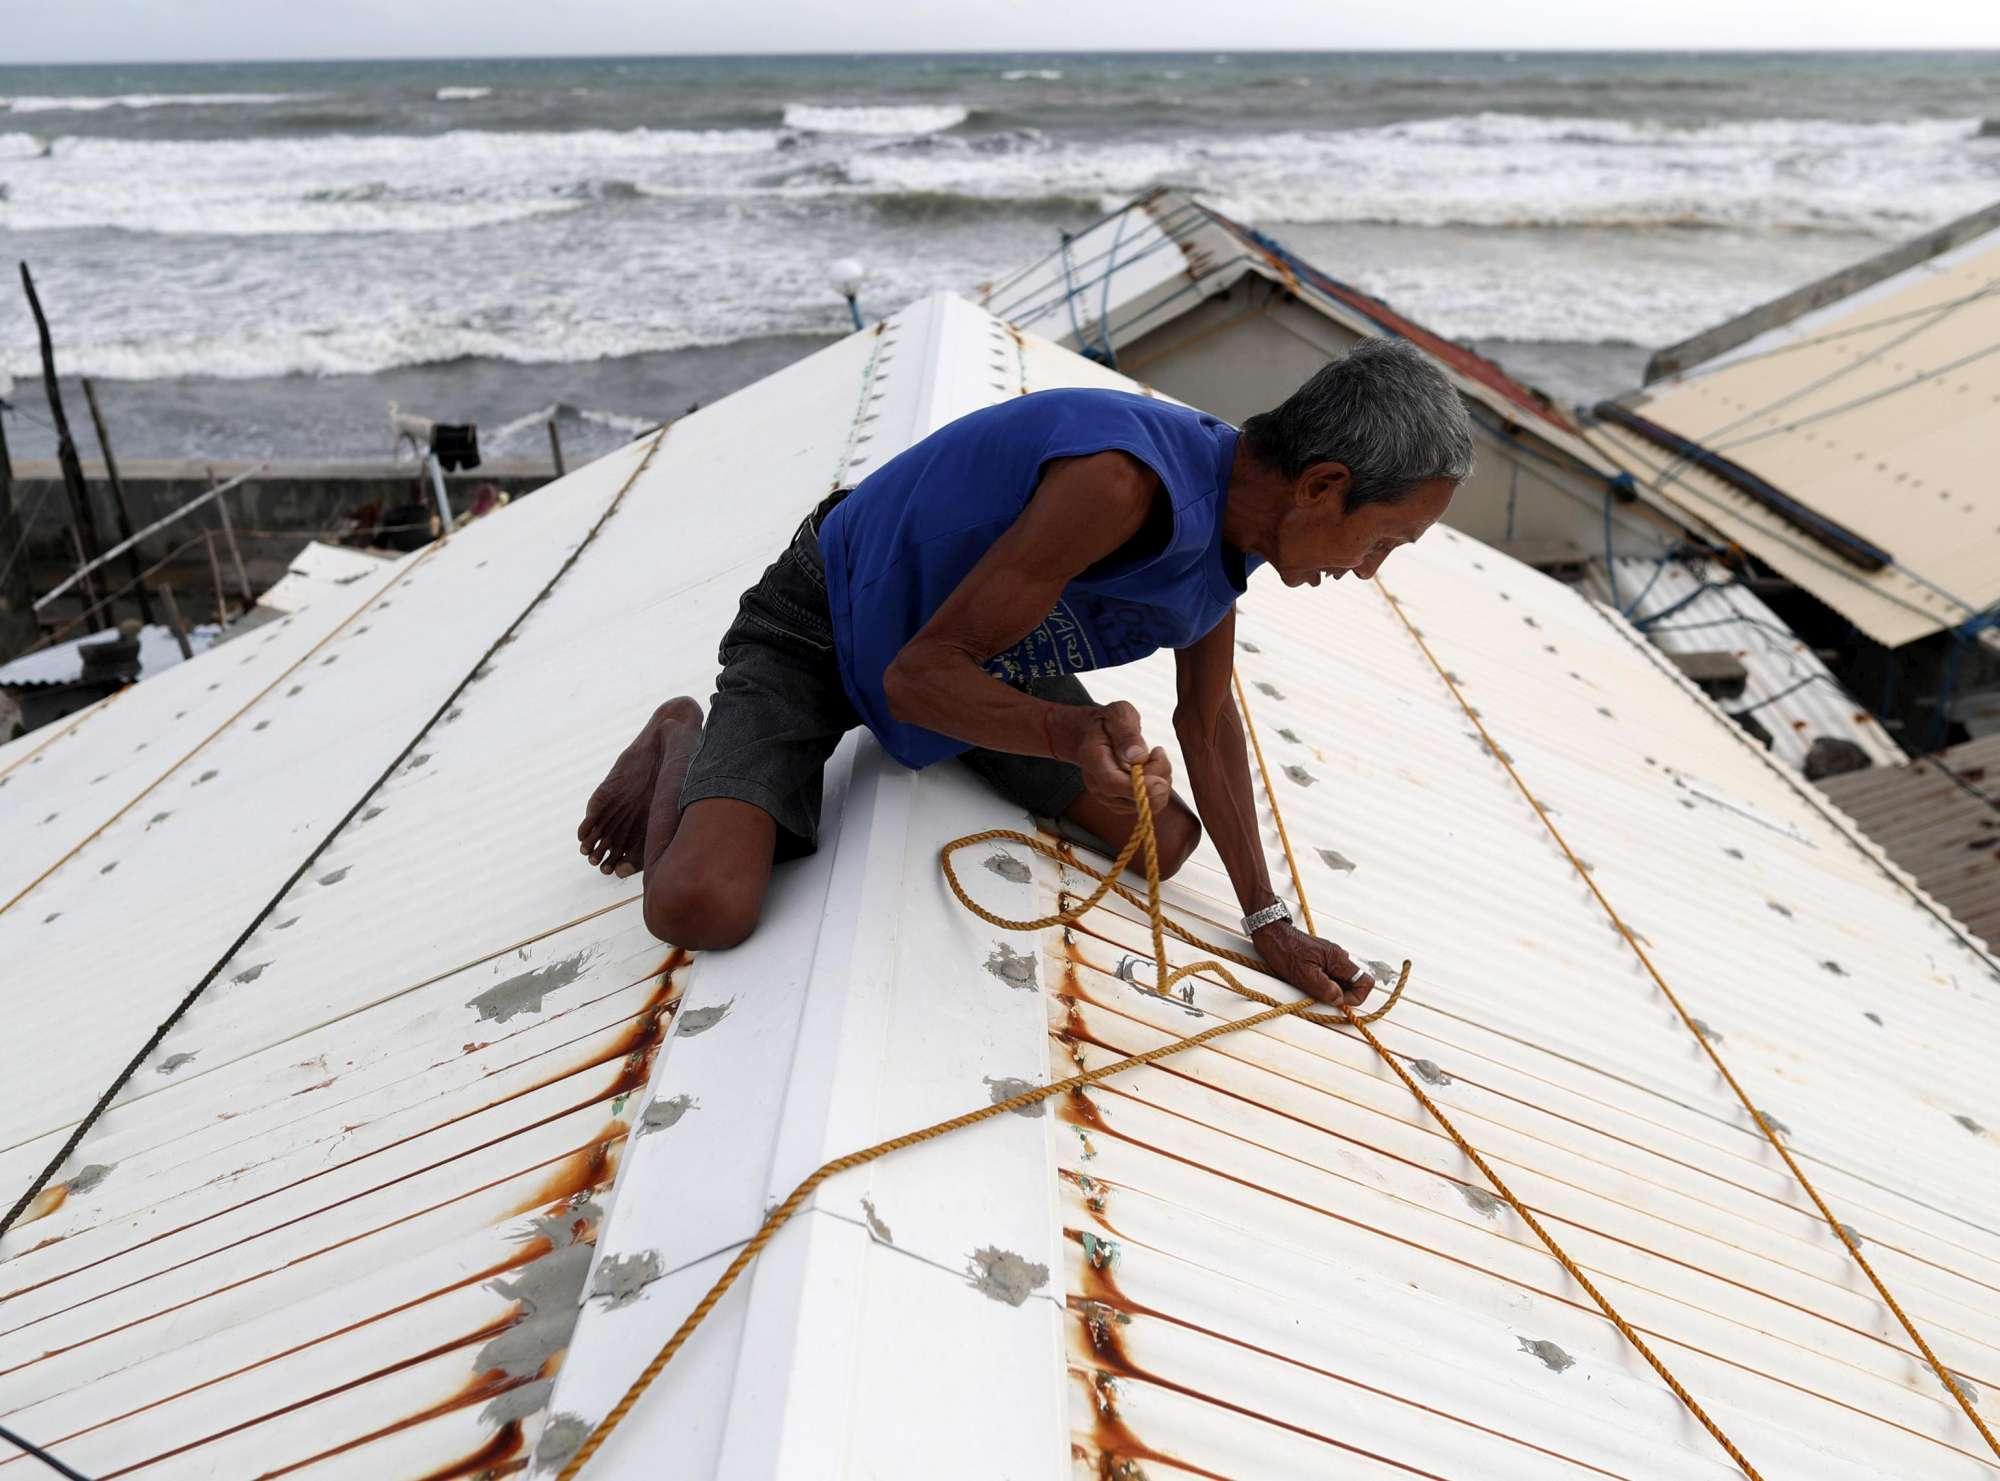 Tifone devasta Filippine: si temono 100 morti